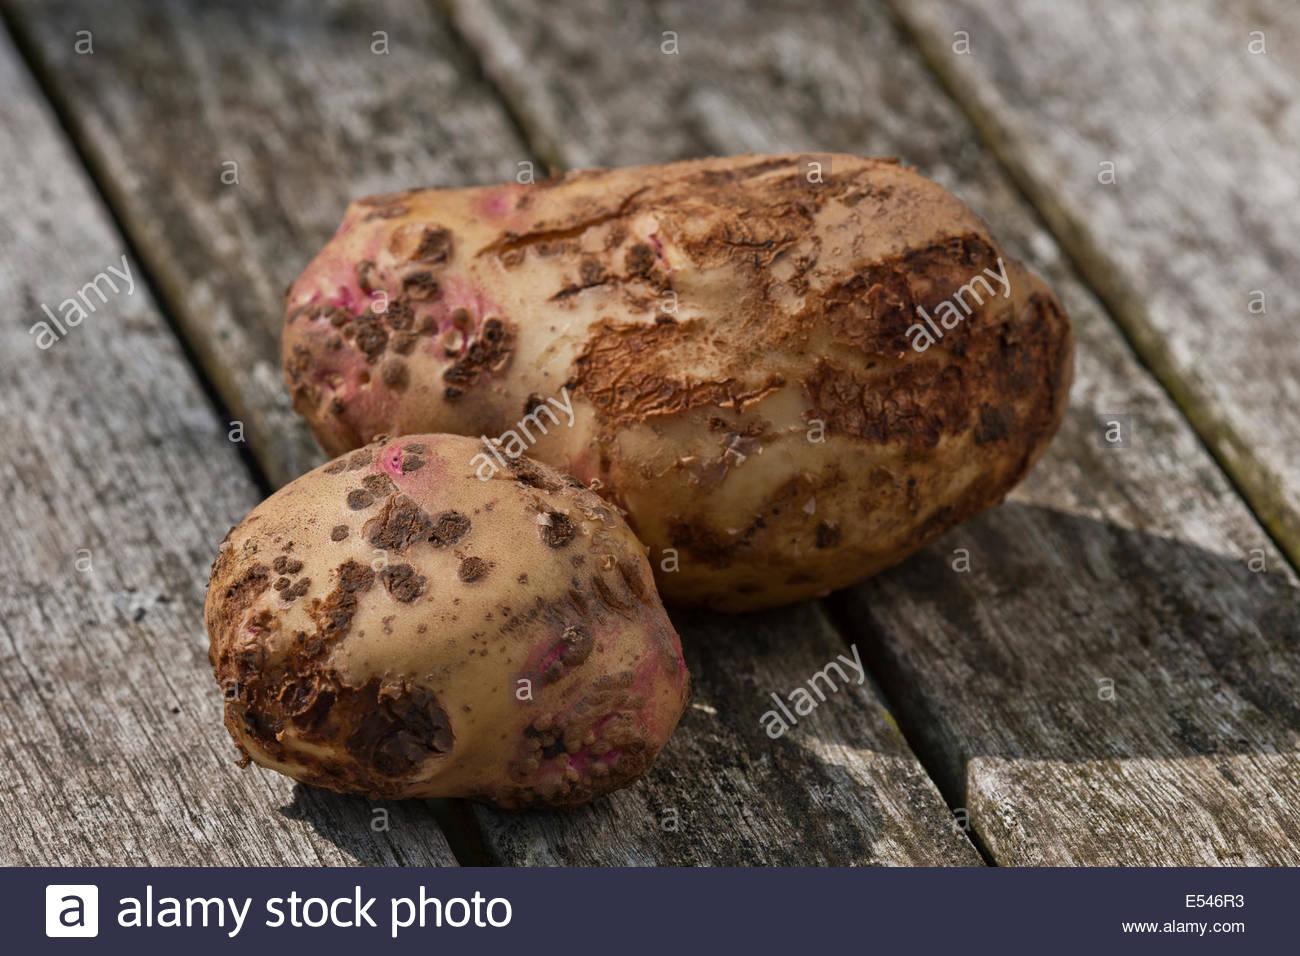 Common scab on potato tuber Streptomyces scabies micro-organism damage crop dryness vegetable kitchen garden problem - Stock Image